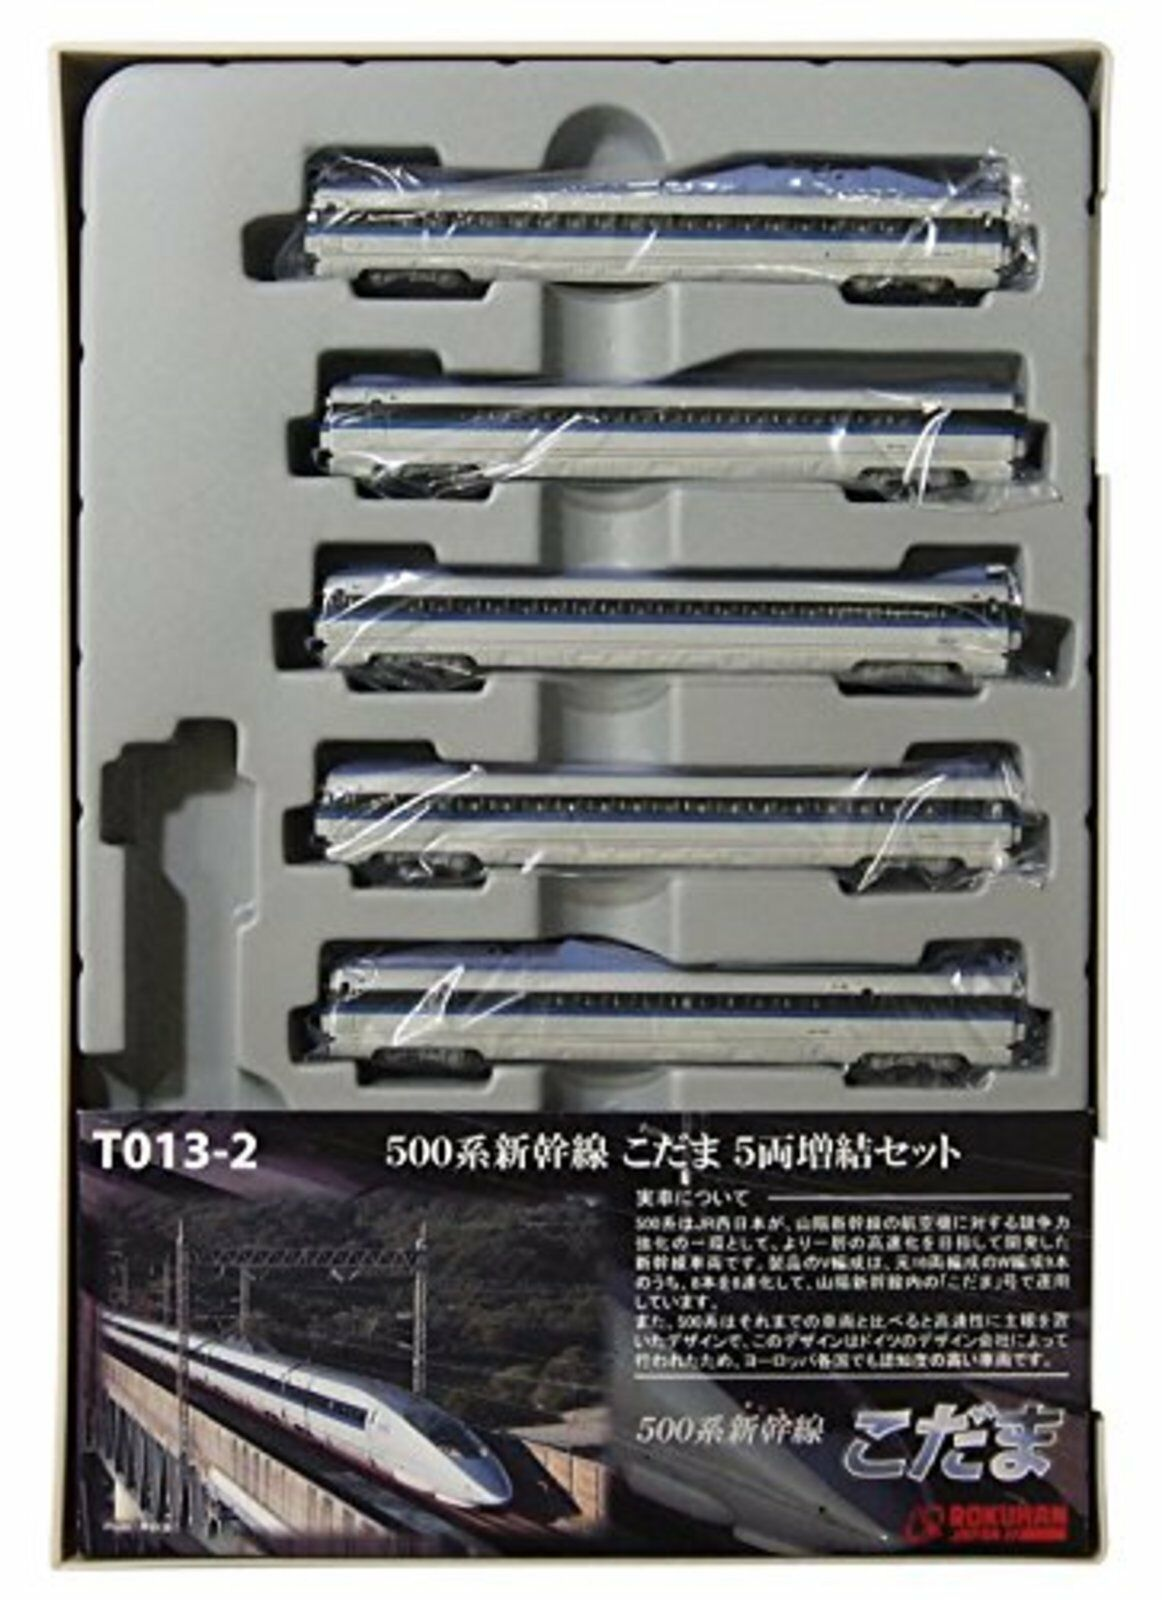 Z Escala T013-2 500 Series Shinkansen V Kodama 5 Cars Addon Juego F S W